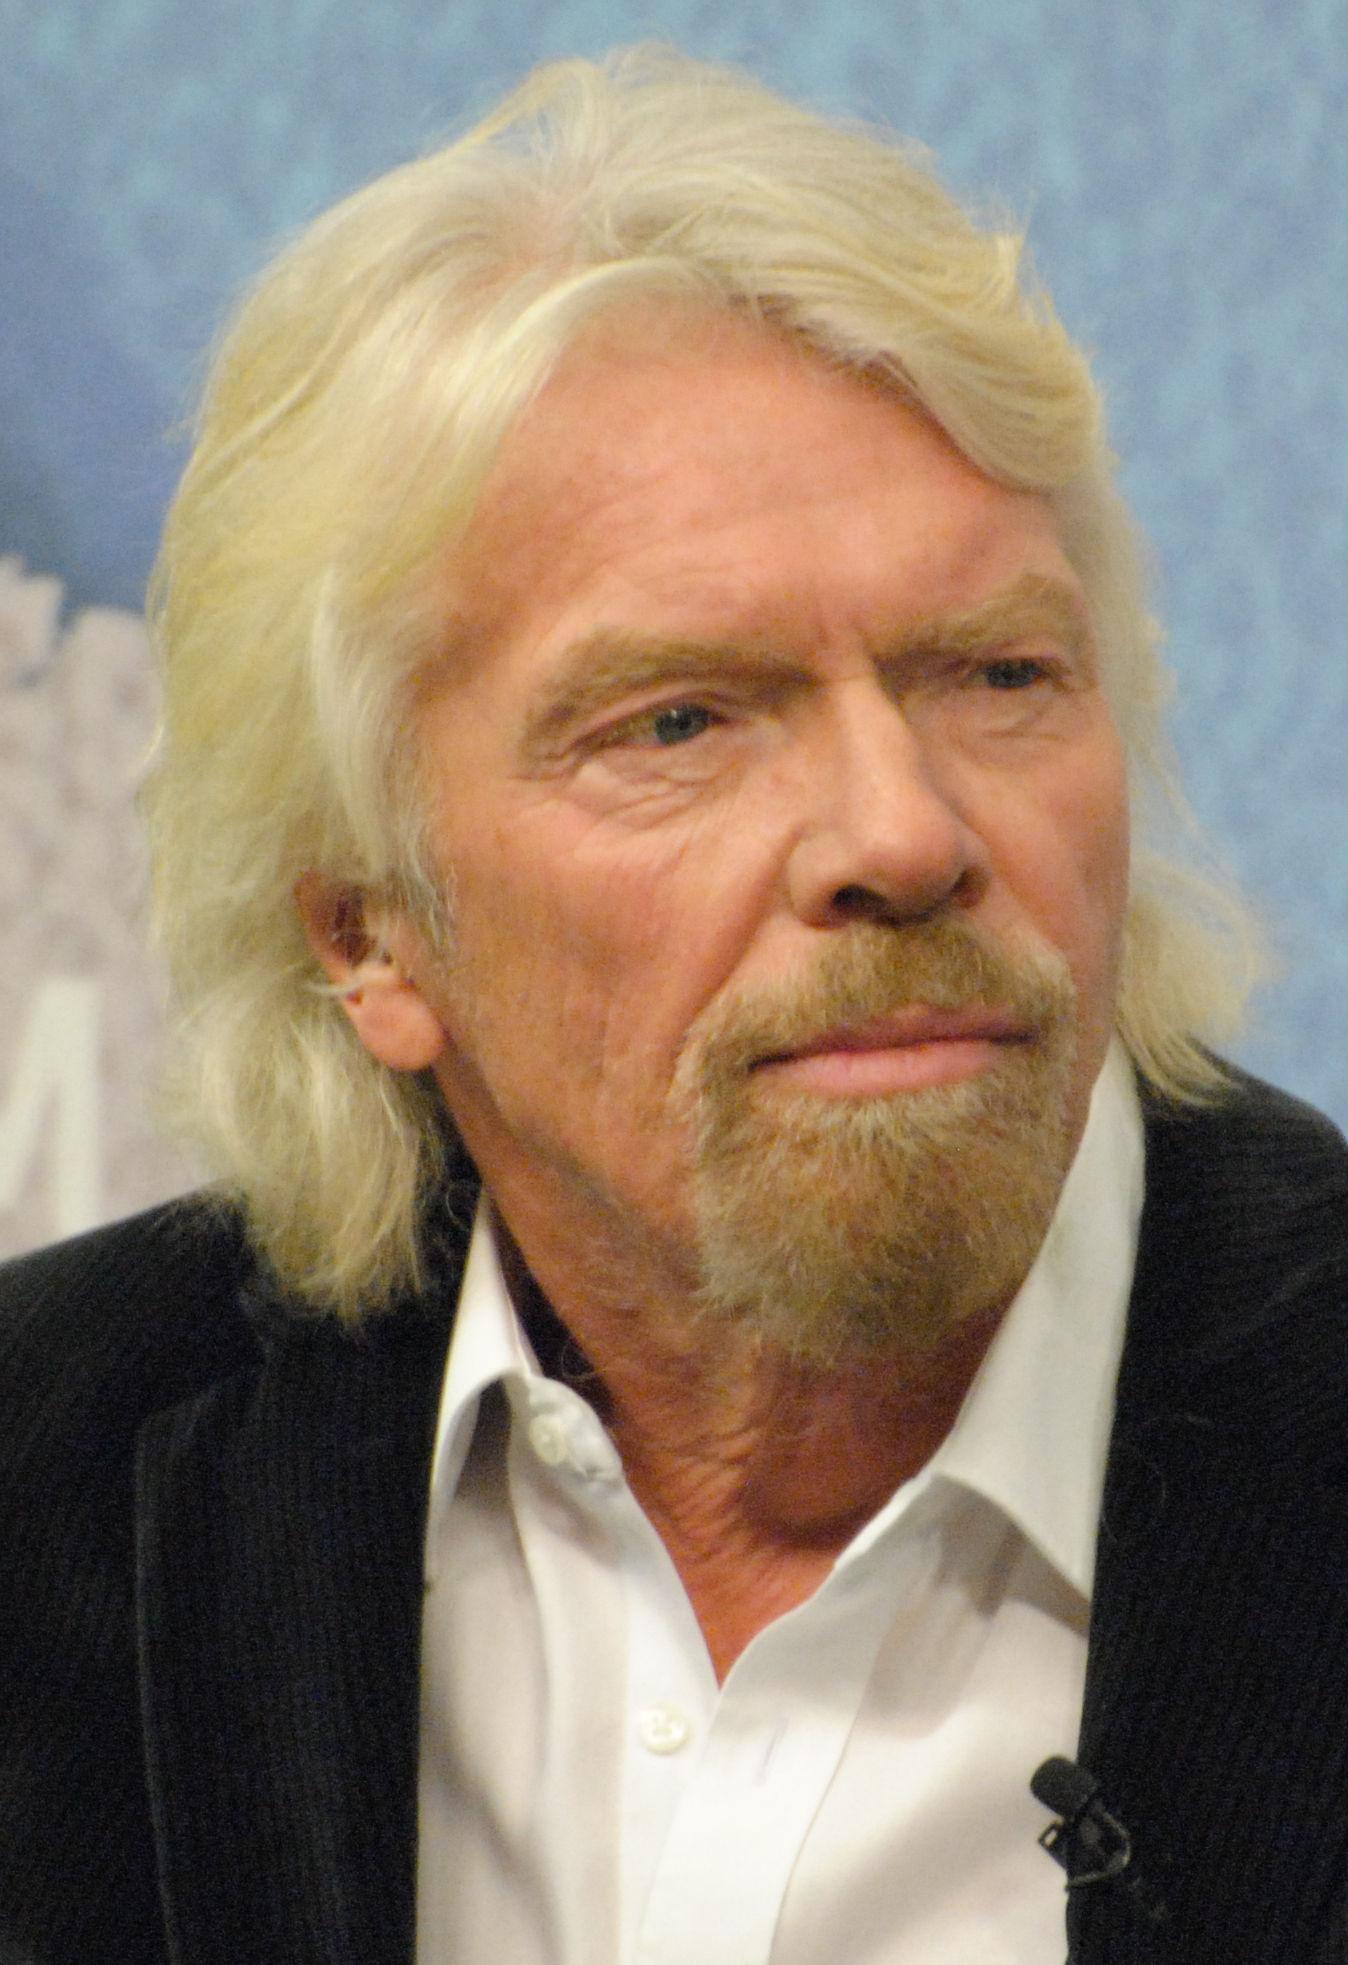 Photo of Richard Branson: British business magnate